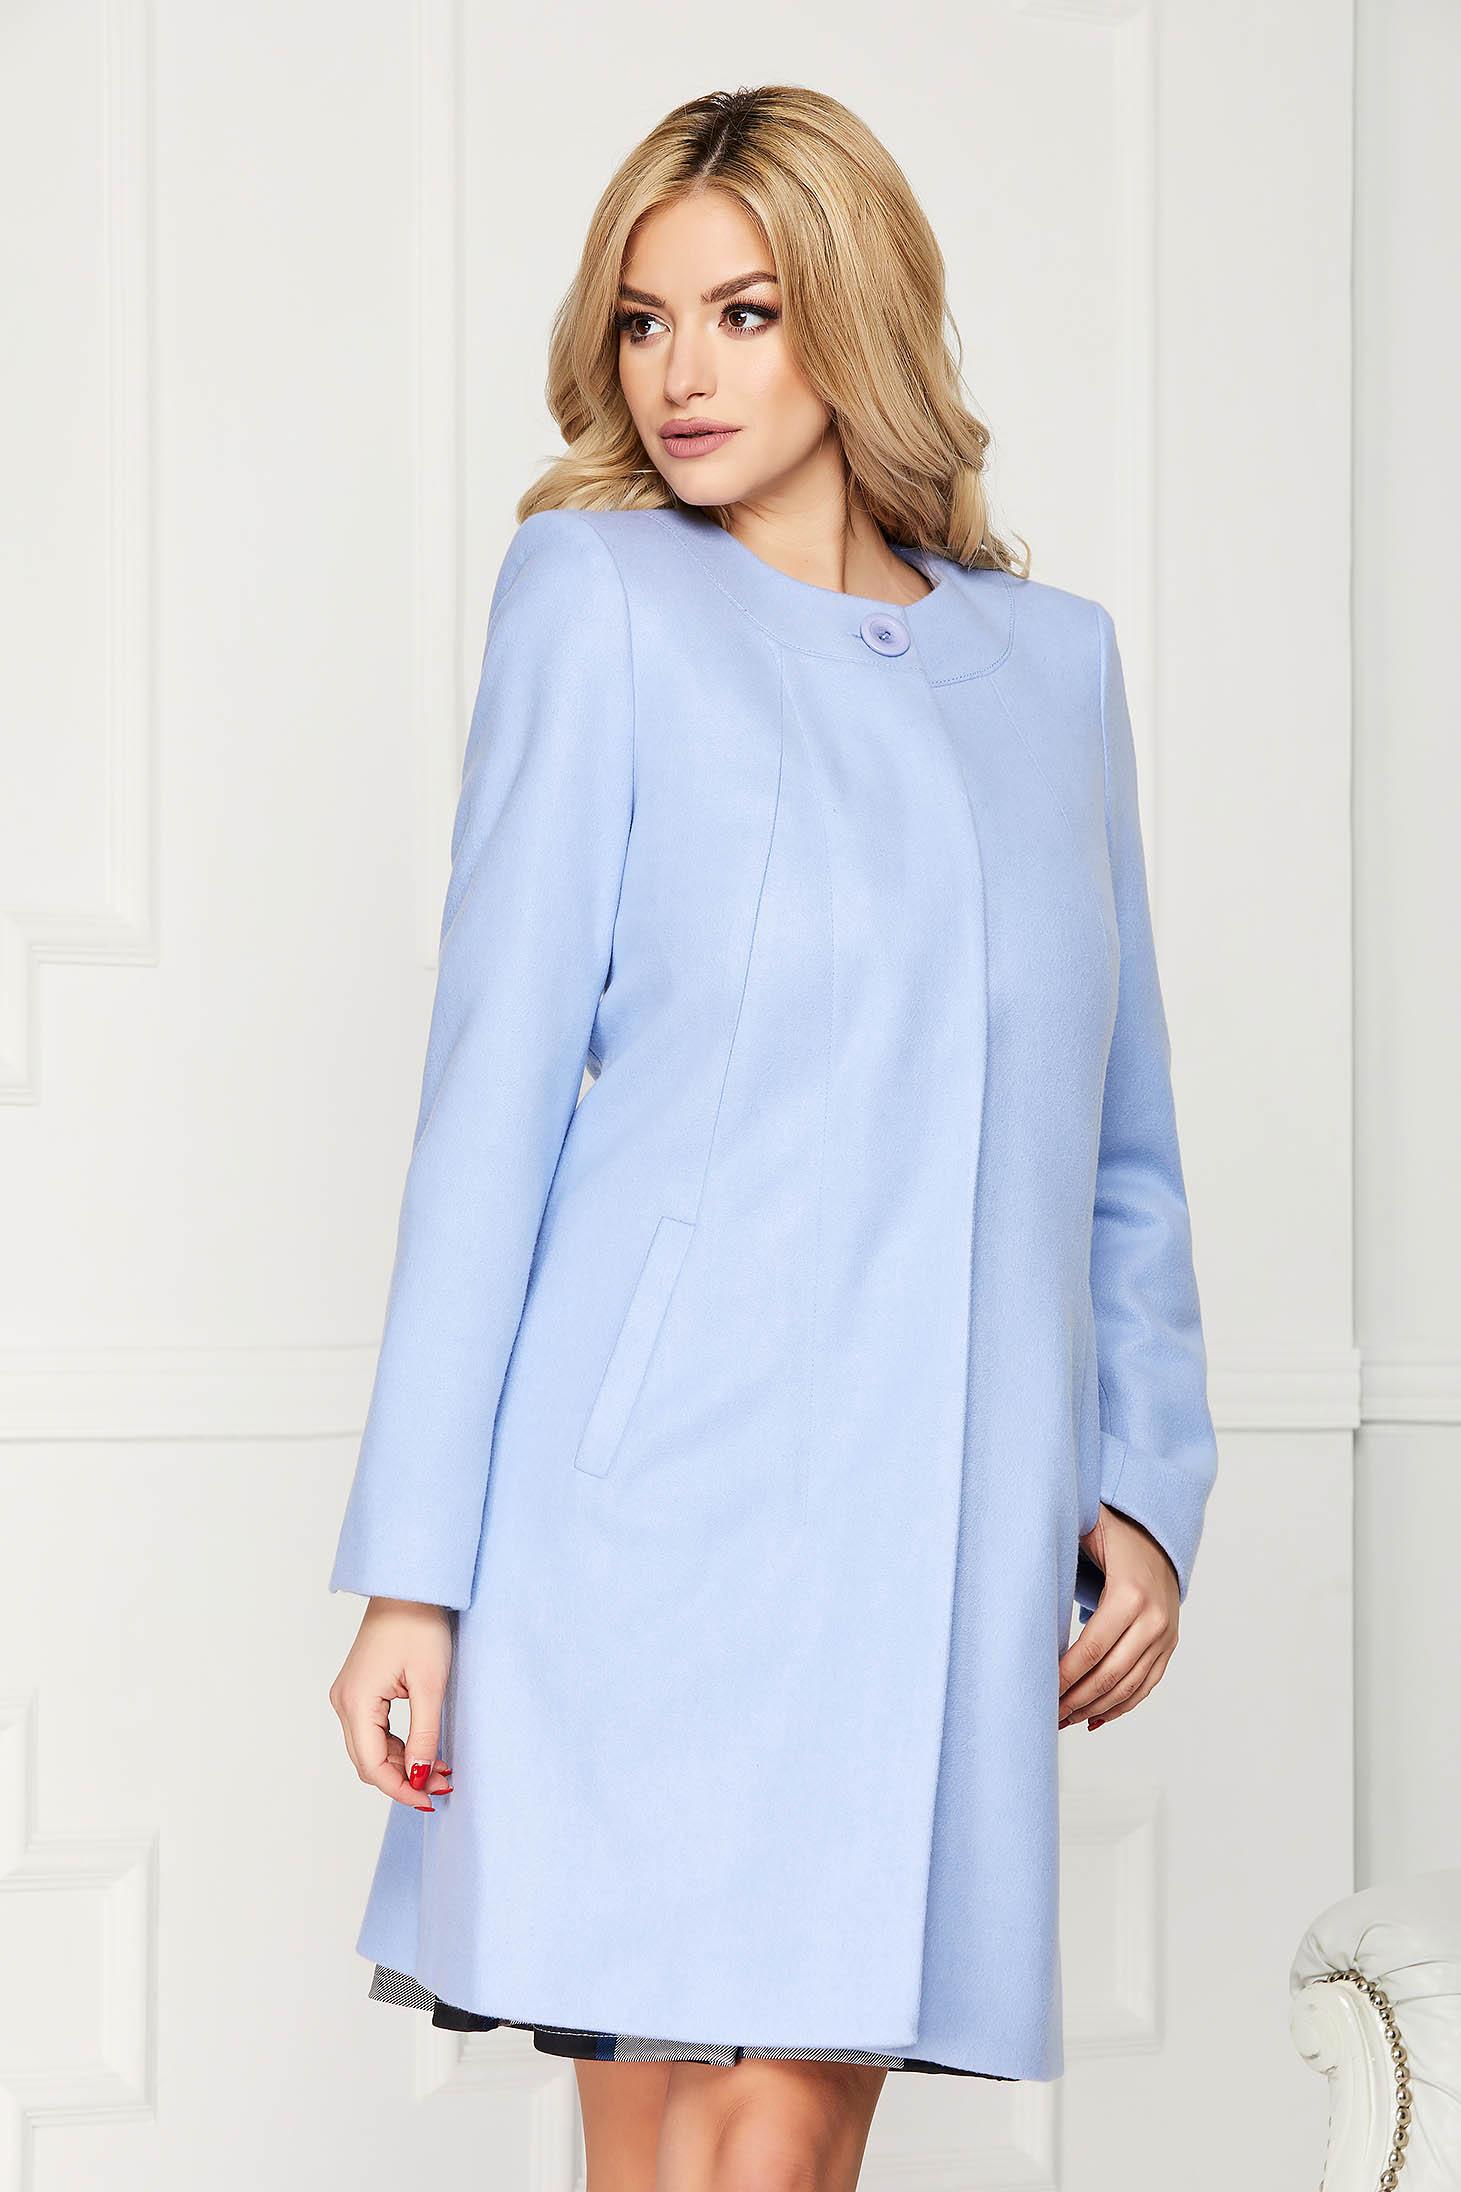 Trench albastru-deschis elegant scurt din lana cu un croi drept si buzunare